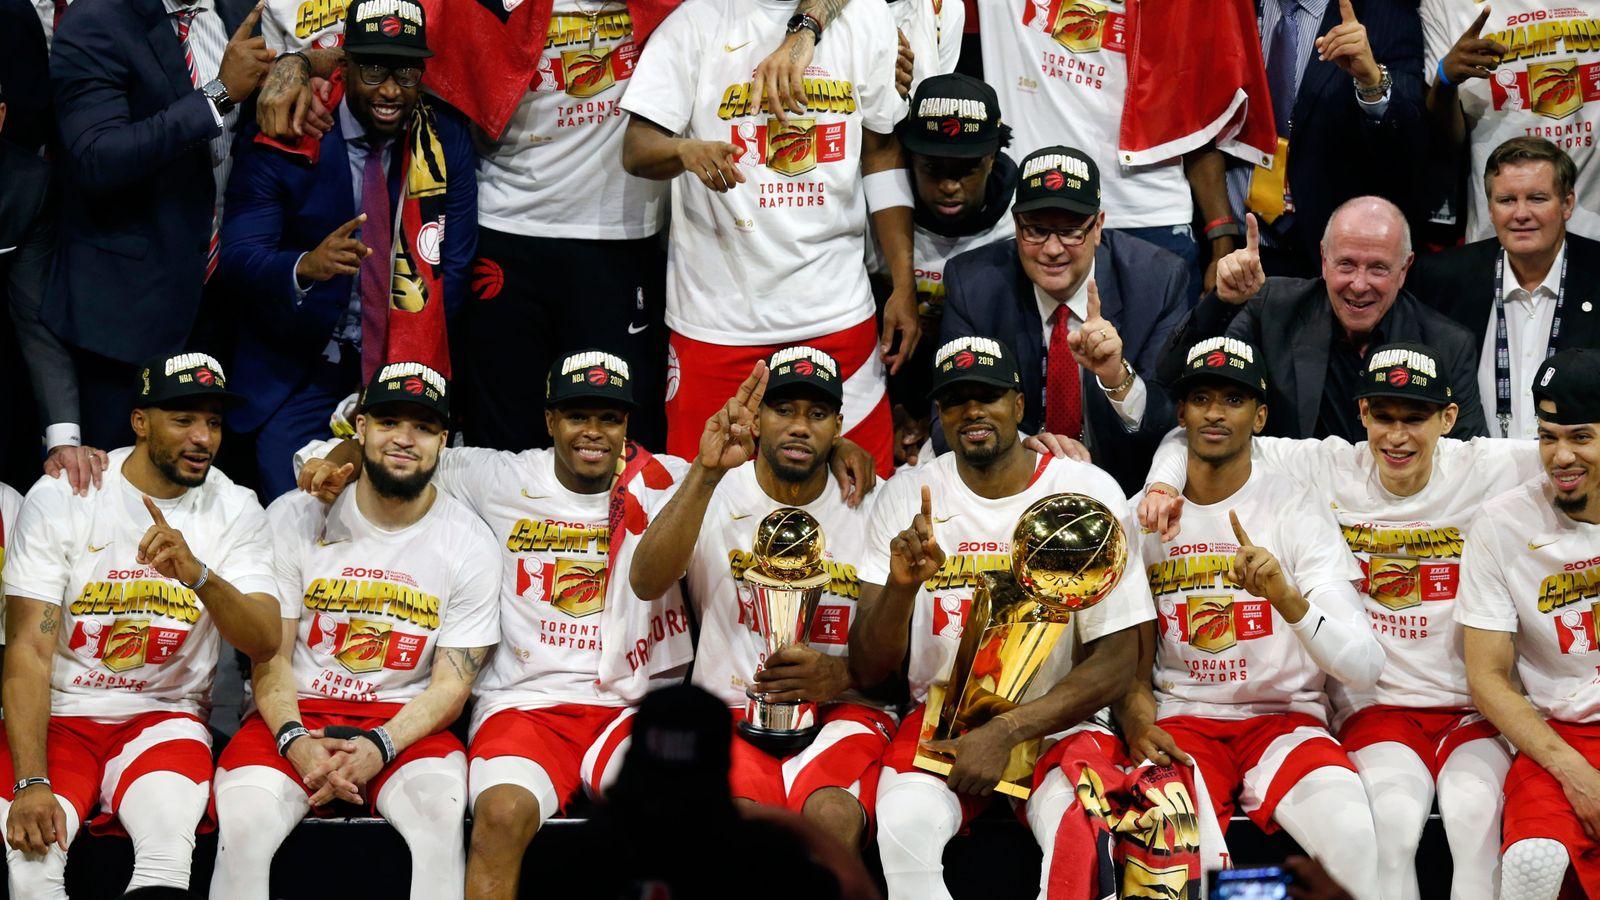 Toronto Raptors Nba Champions Wallpapers: Toronto Raptors Win Maiden NBA Championship With Game 6